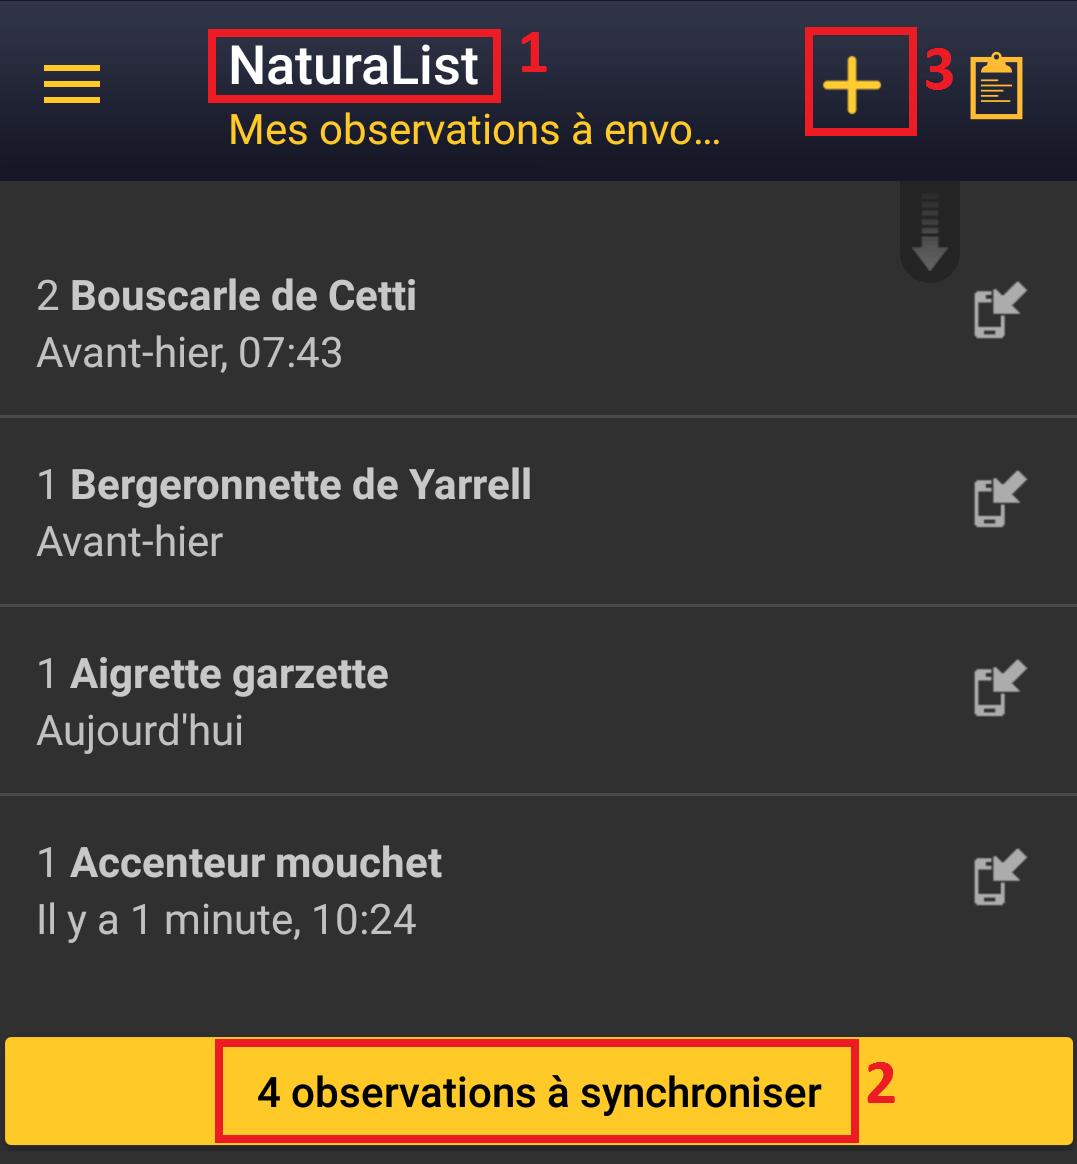 https://cdnfiles2.biolovision.net/www.faune-france.org/userfiles/ListeNaturaList/10-synchroniser-obs.png